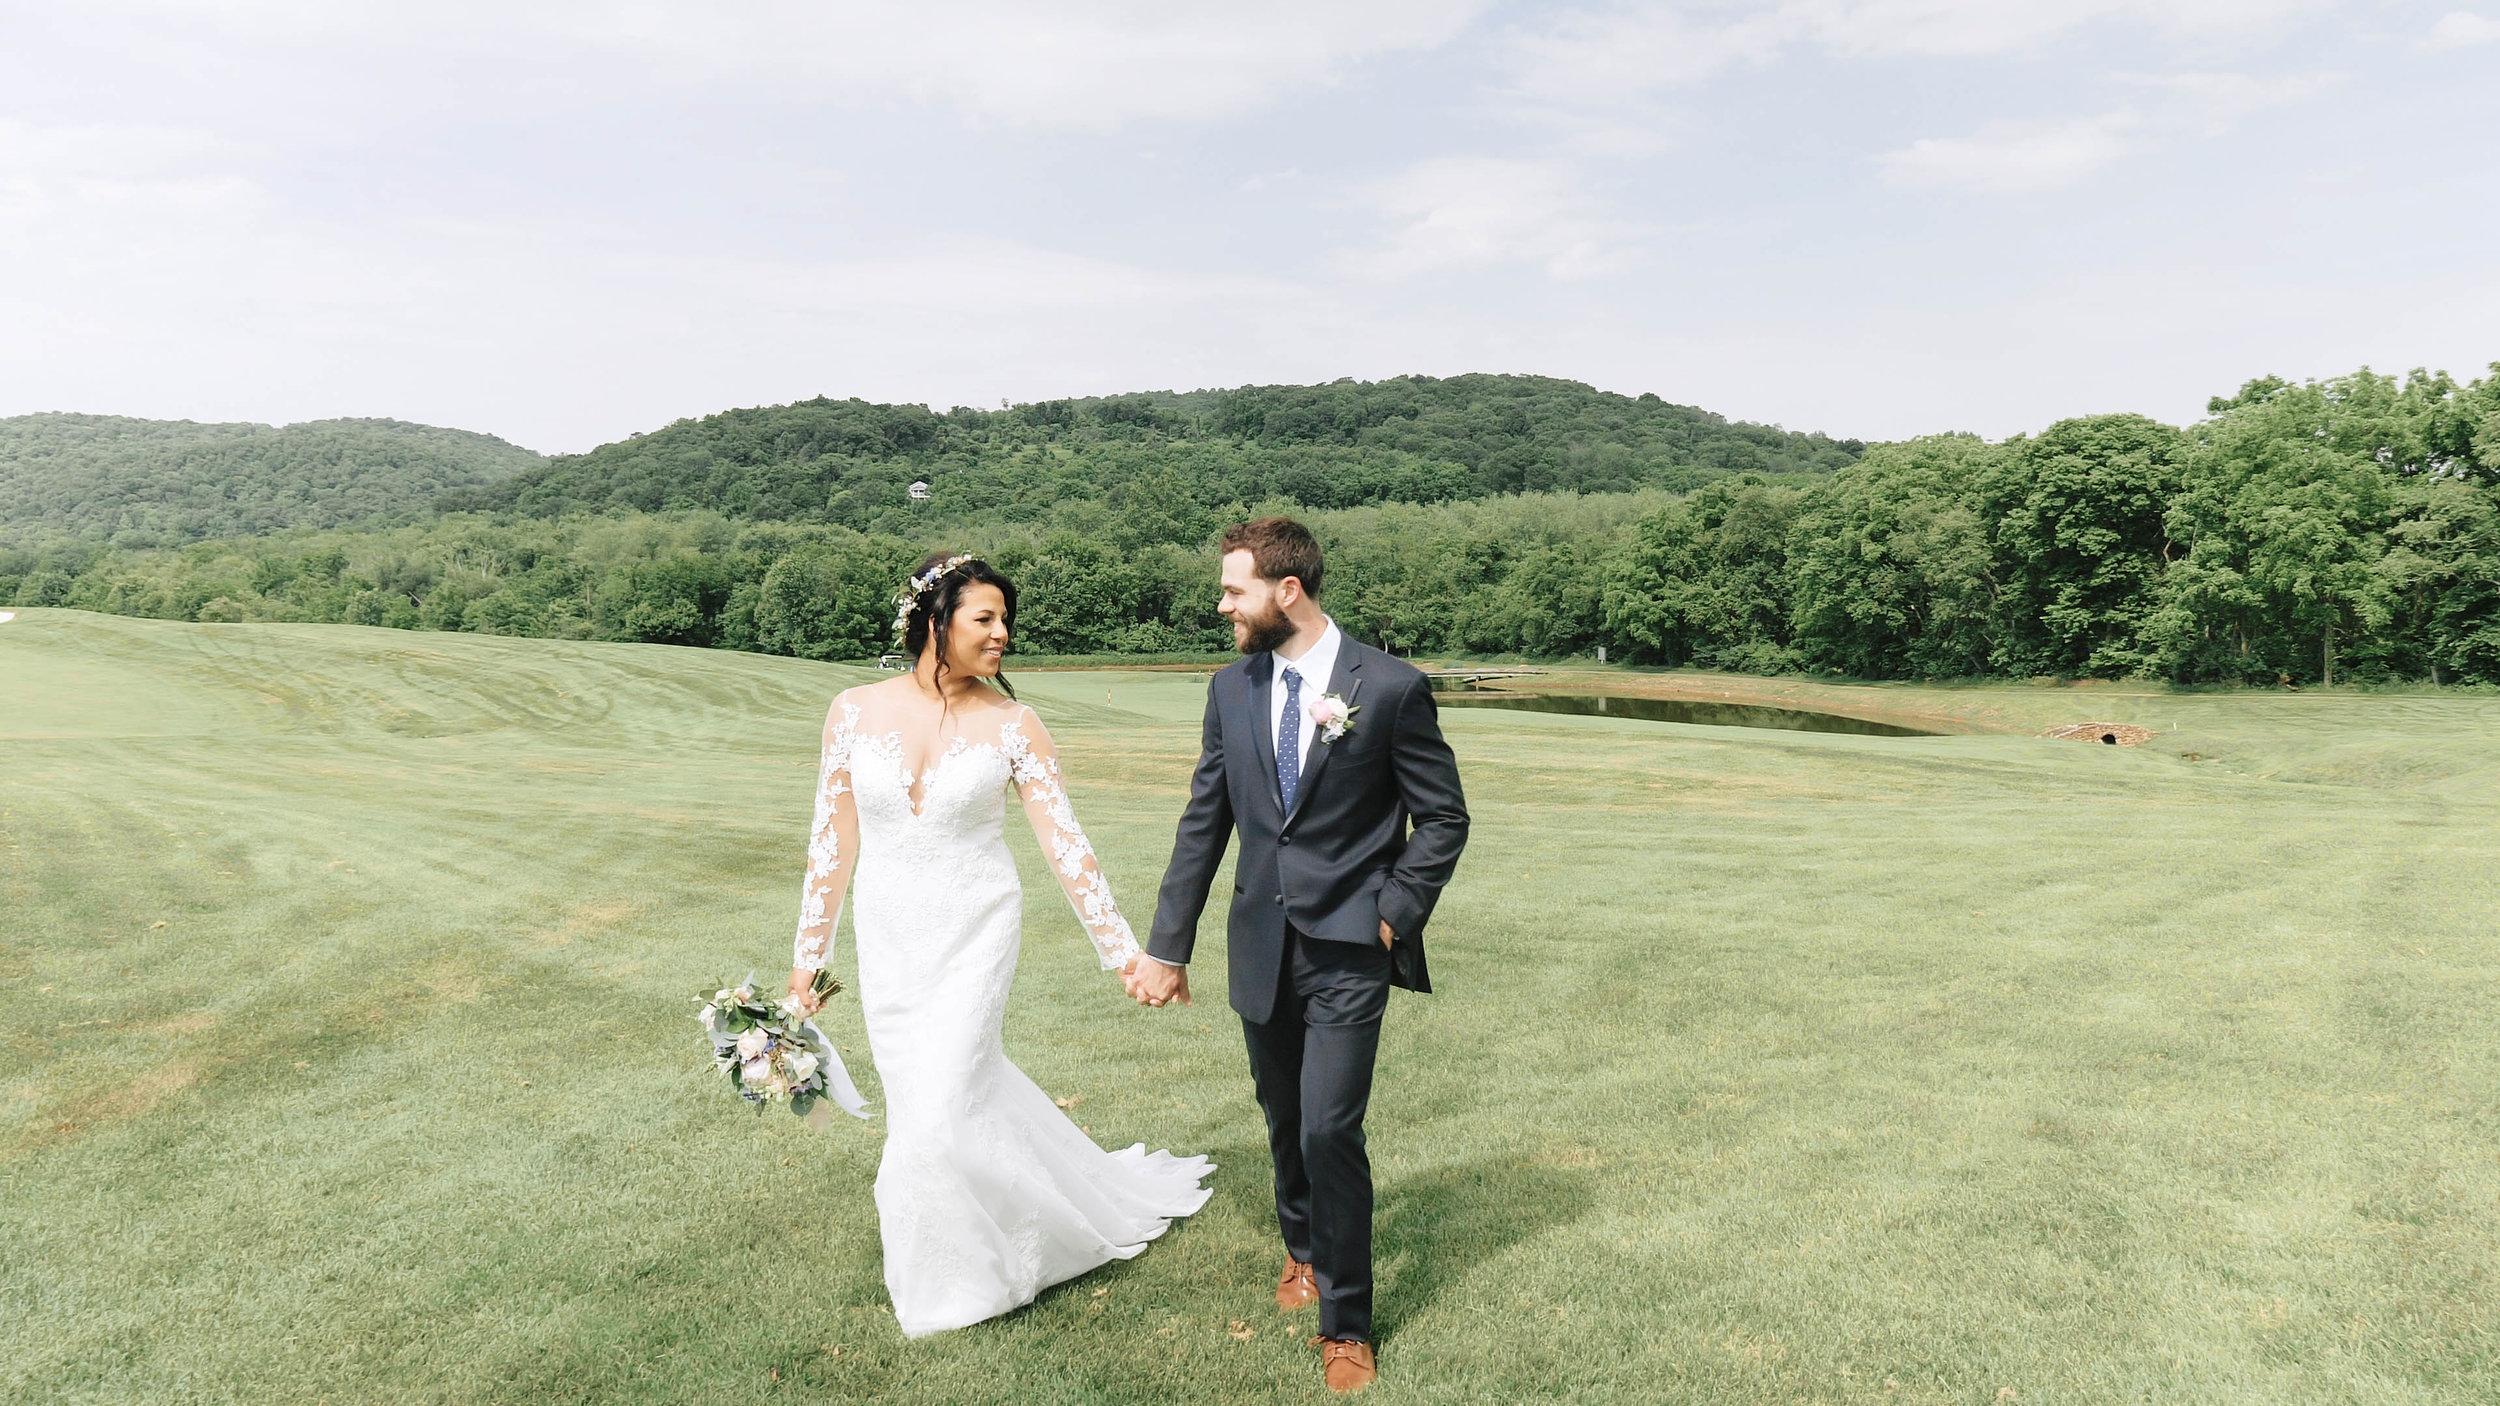 Tonemedia, NJ Wedding Videographer, NJ Wedding Videopgraphy, NJ Wedding Video, The Architects Golf Club,The Architects Golf Club Wedding,Architects Golf Club Wedding Video, Golf Club Wedding